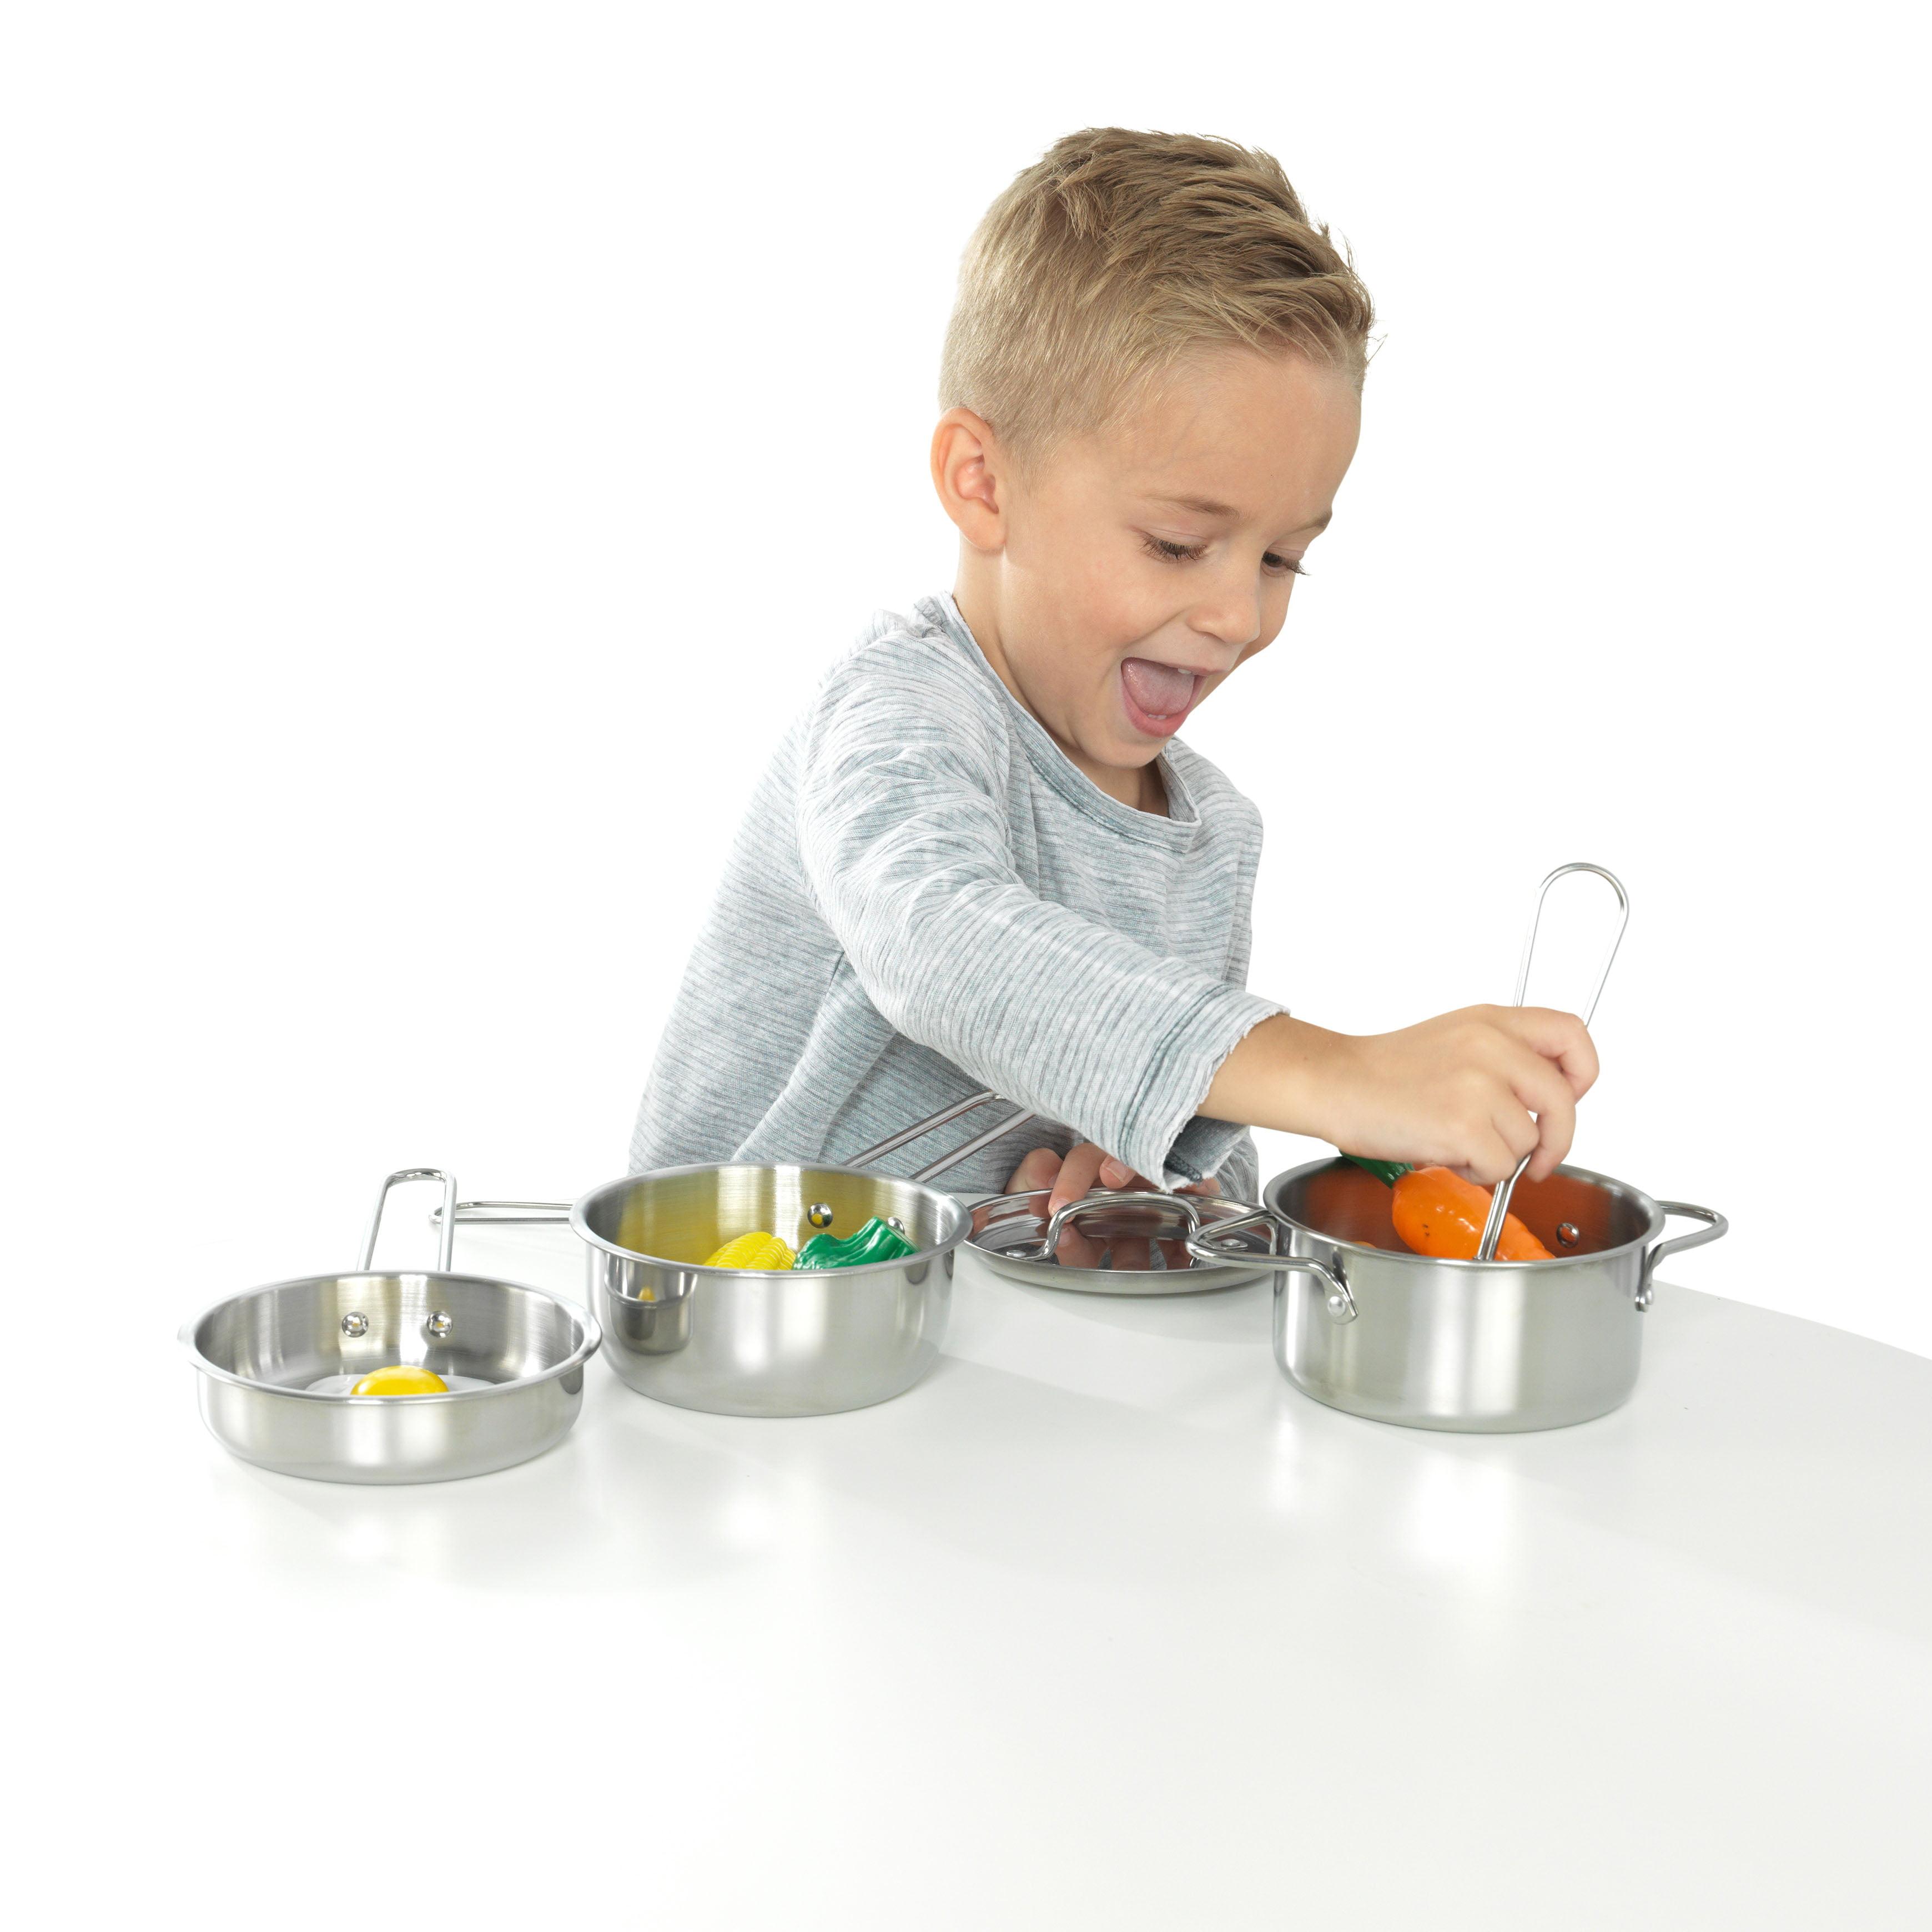 KidKraft Deluxe Cookware Set with Food by KidKraft